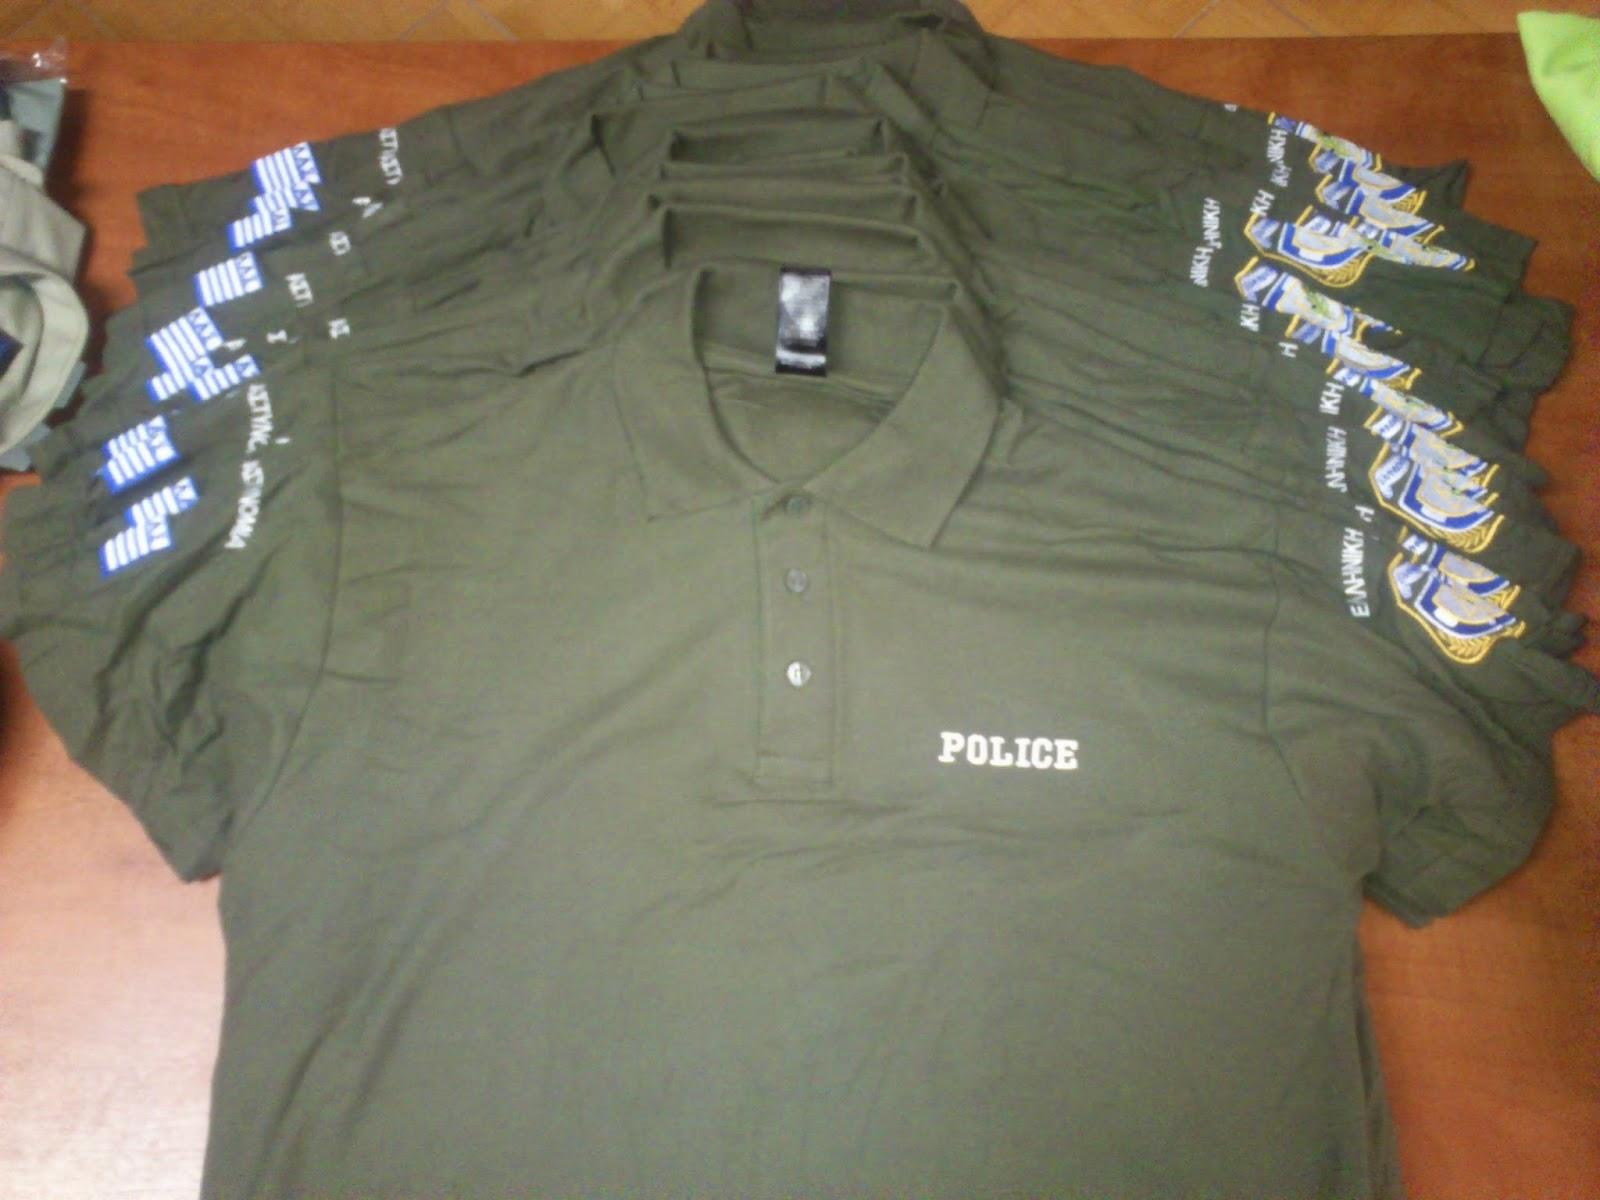 2b26c39c5863 MPIMPOS ARMY SHOP - TACTICAL SPORTSWEAR  Polo t-shirt χακί χρώμα ...